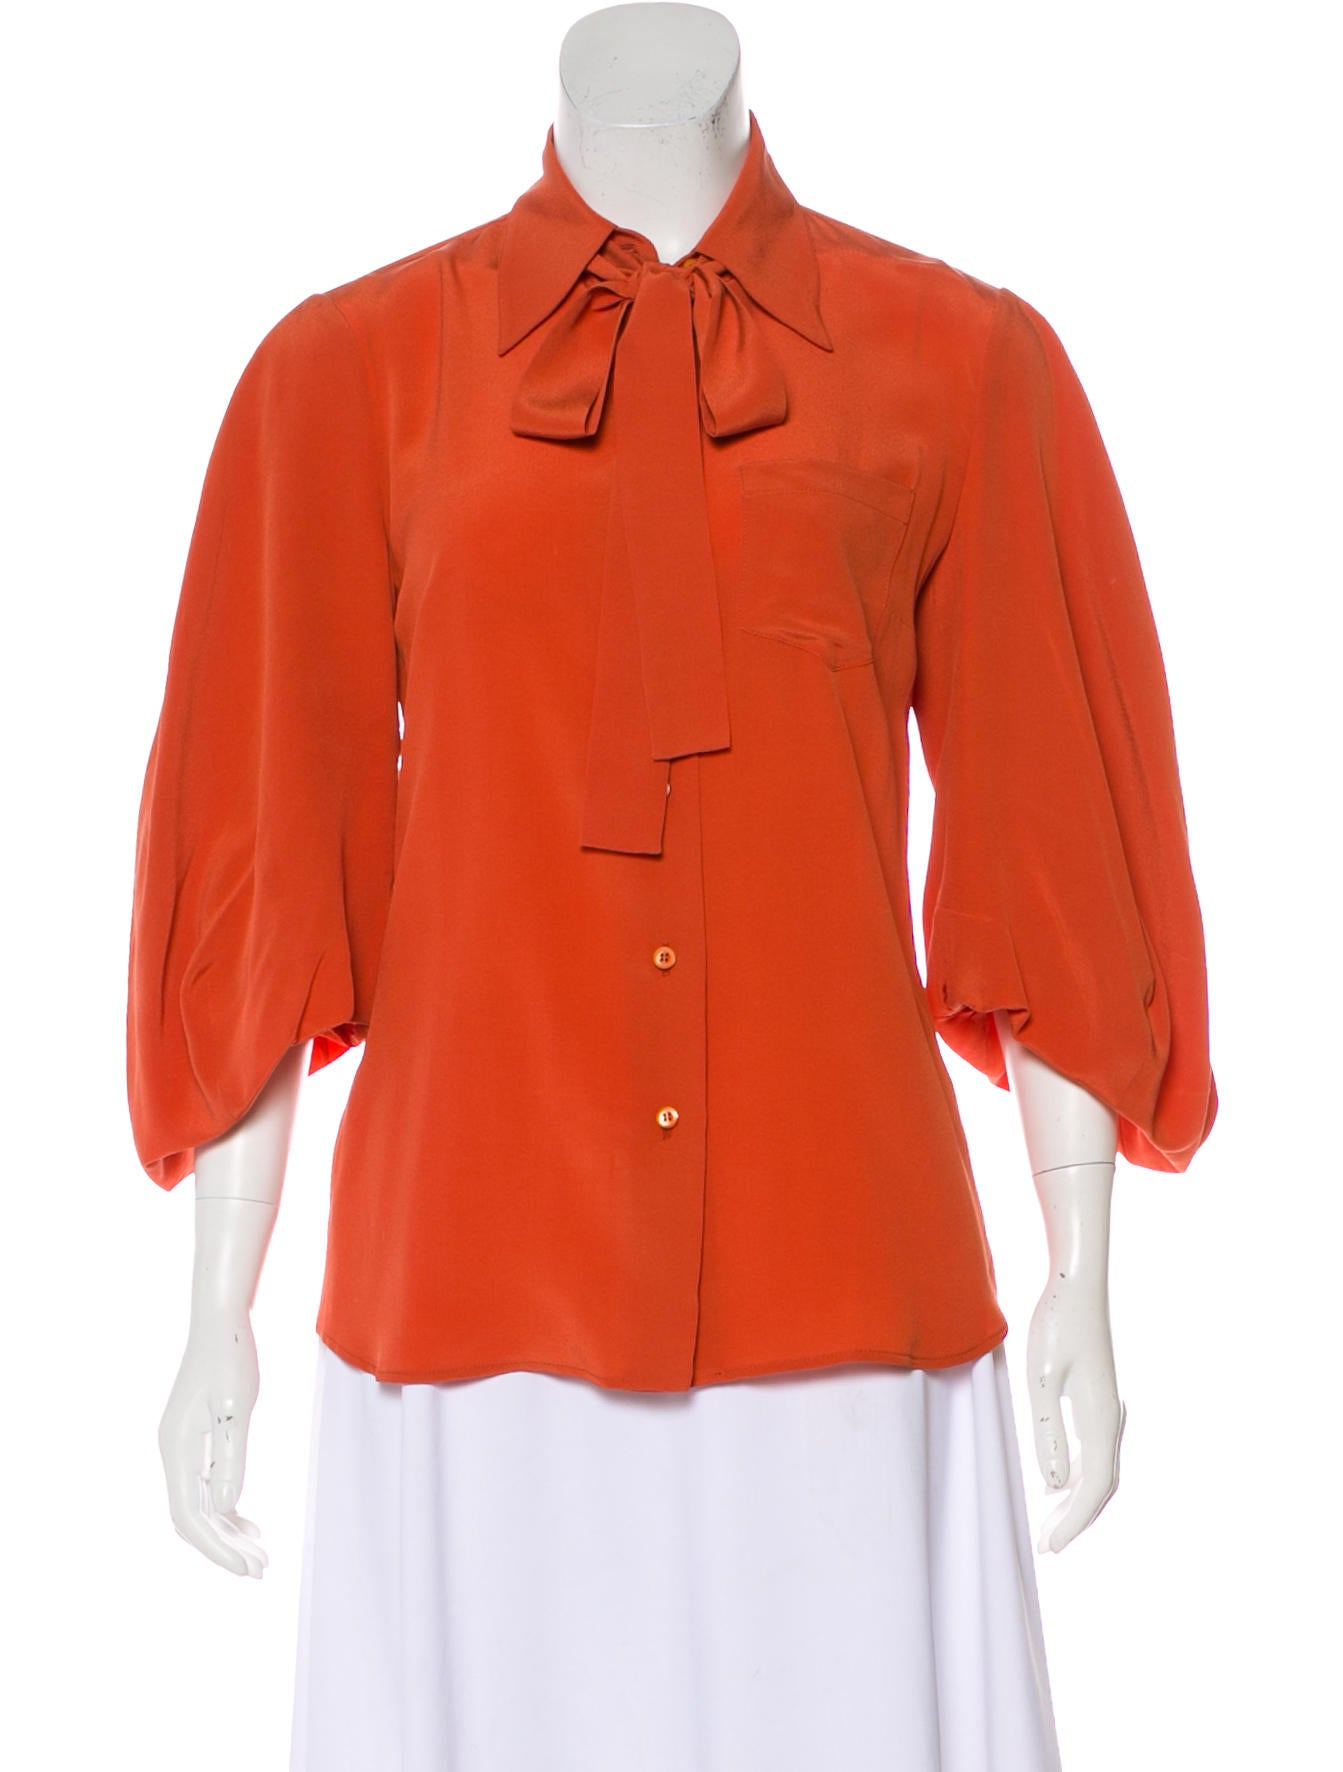 c325cf31a5e15f Prada Silk Button-Up Blouse - Clothing - PRA228526